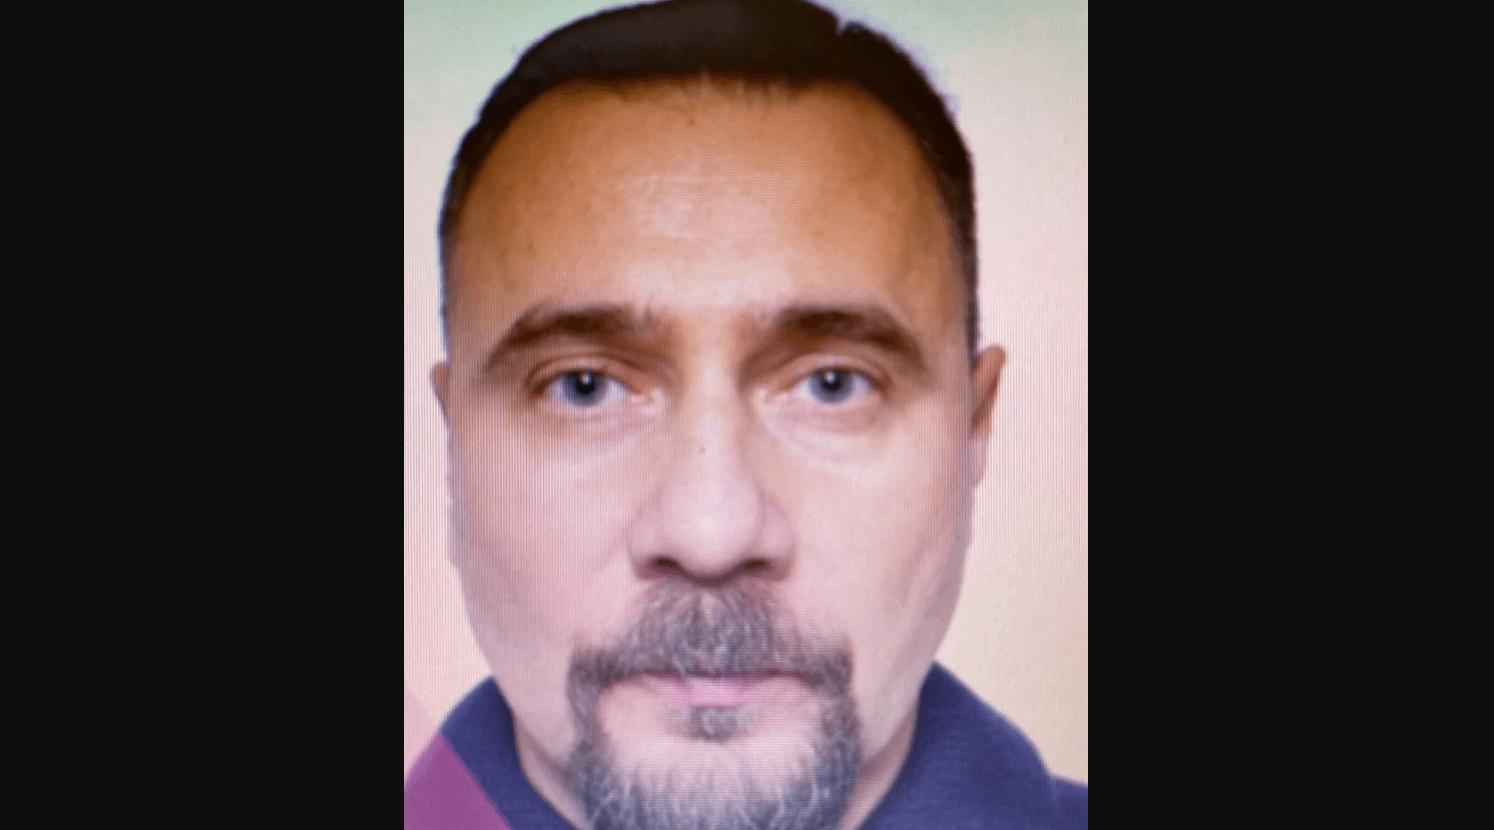 Павел Свитайло – мошенник в образе «адвоката»